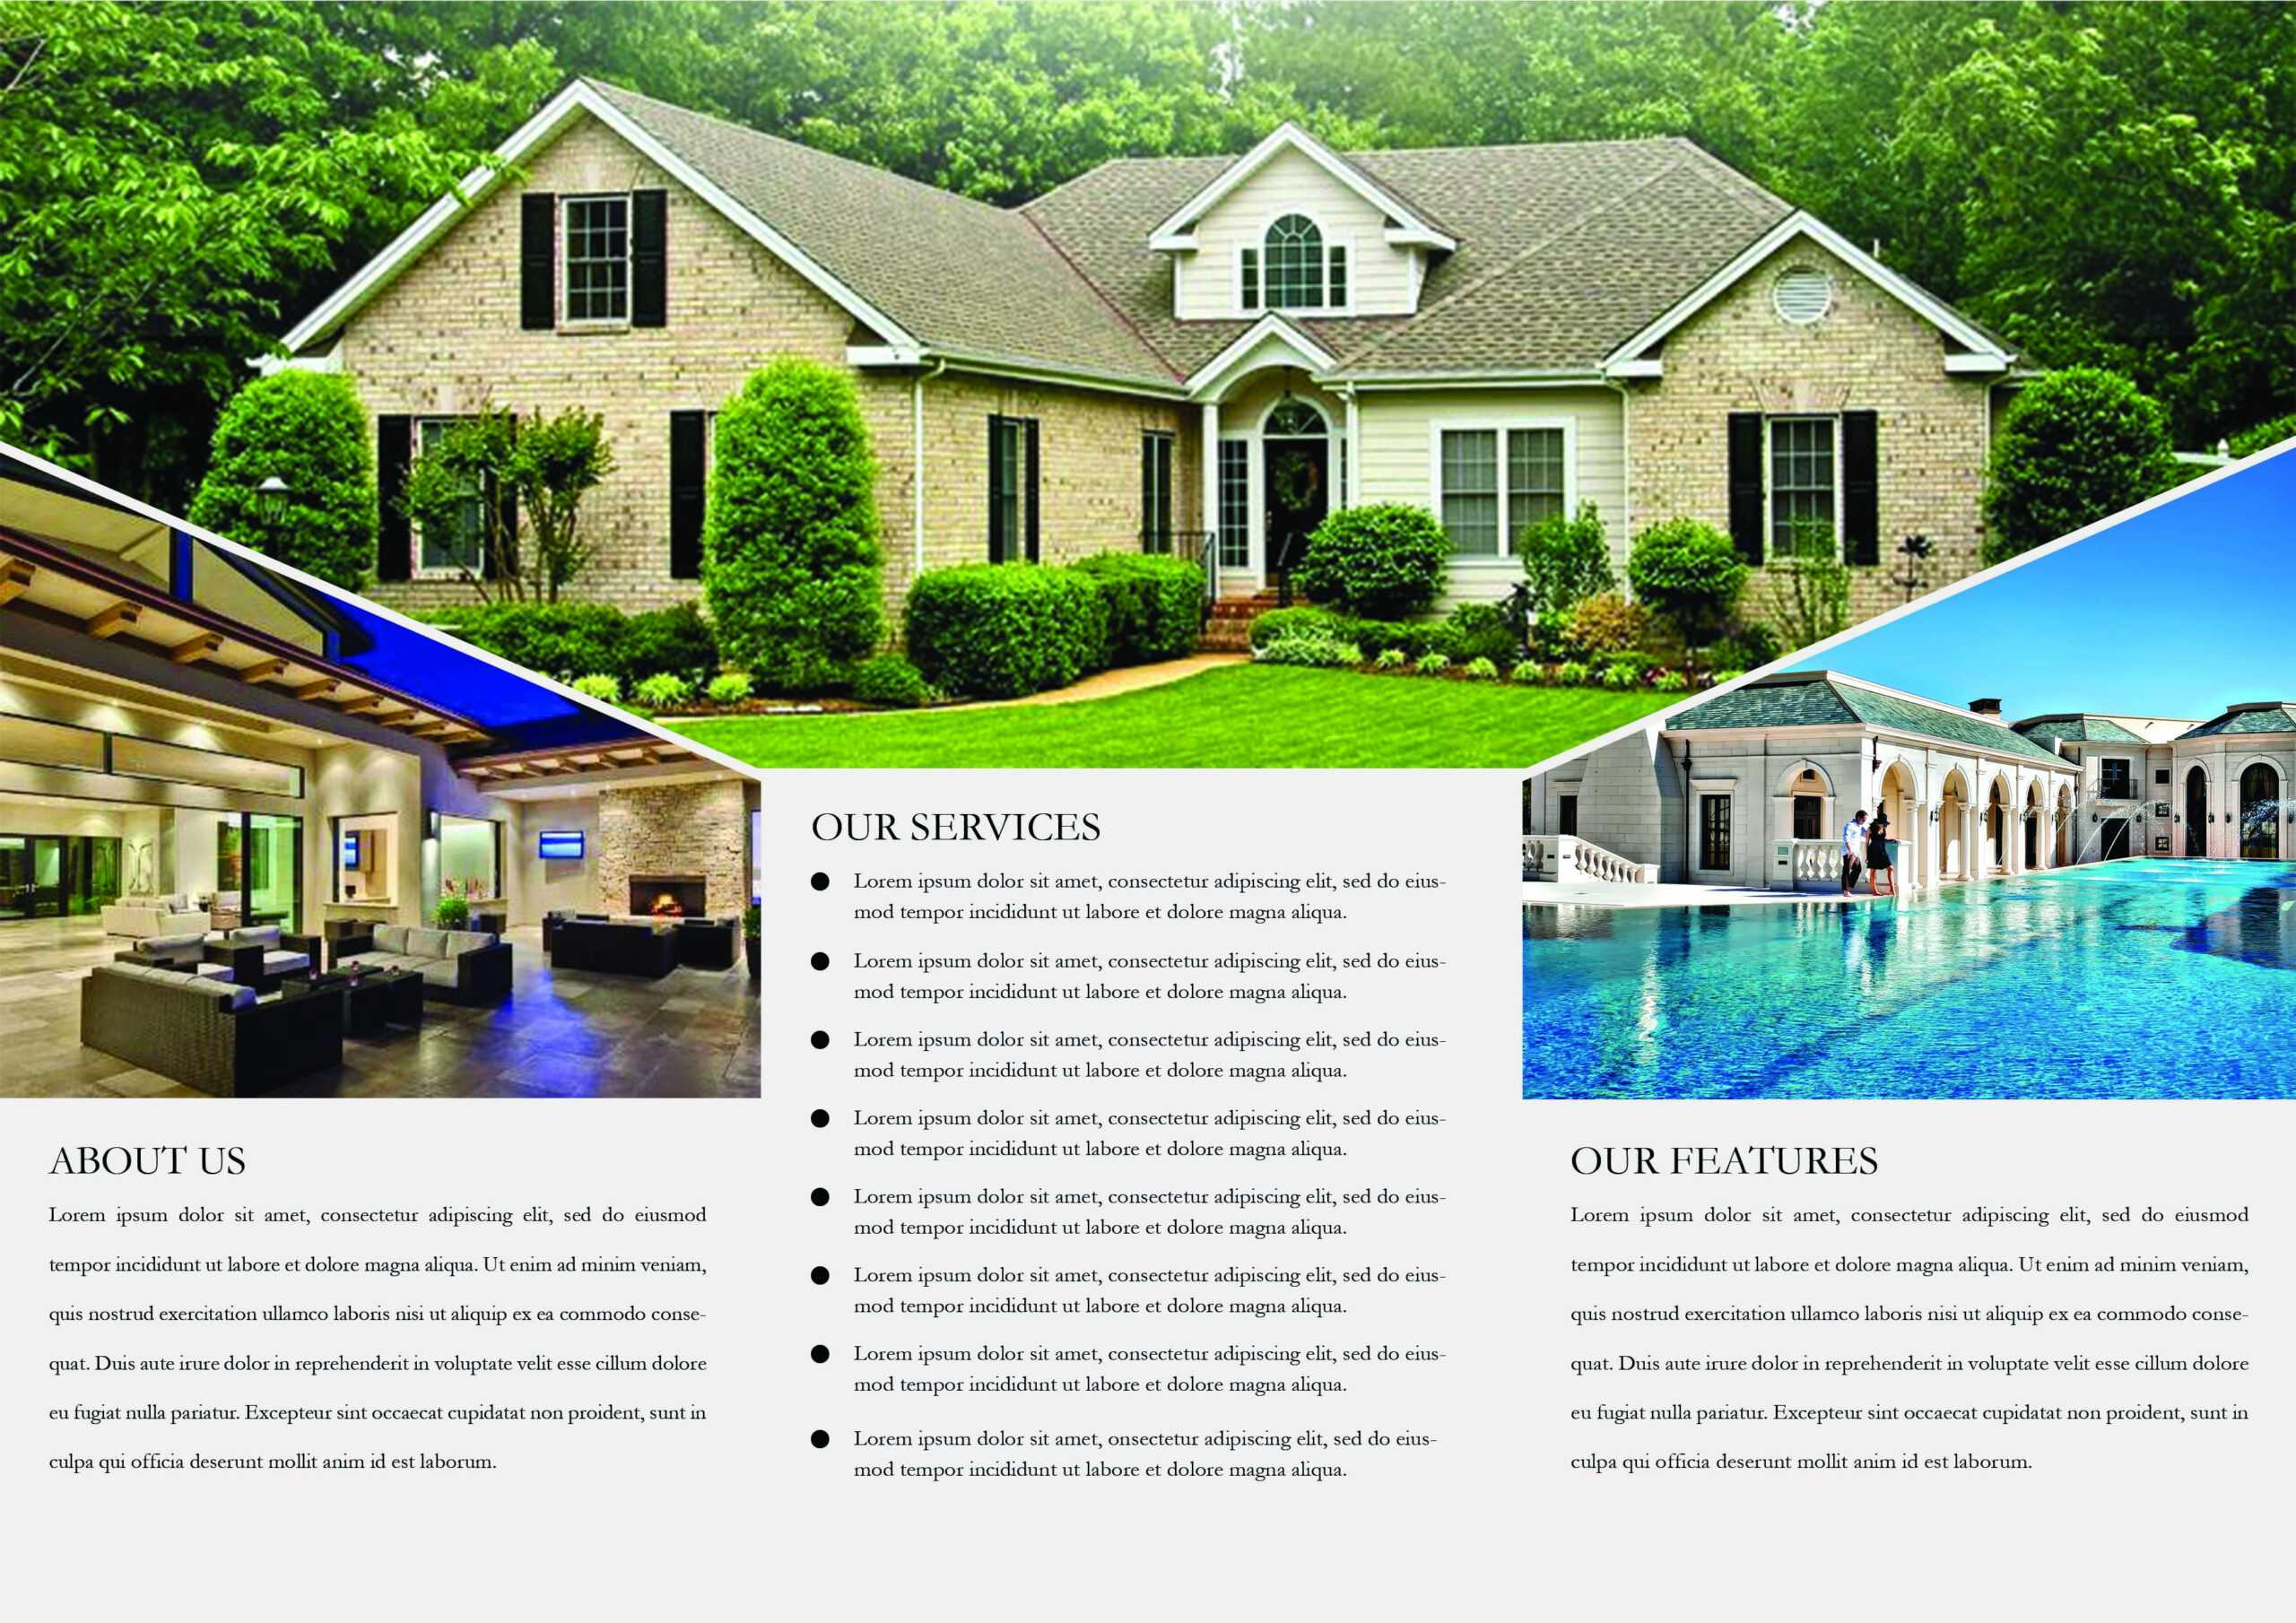 65+ Print Ready Brochure Templates Free Psd Indesign & Ai Regarding Real Estate Brochure Templates Psd Free Download